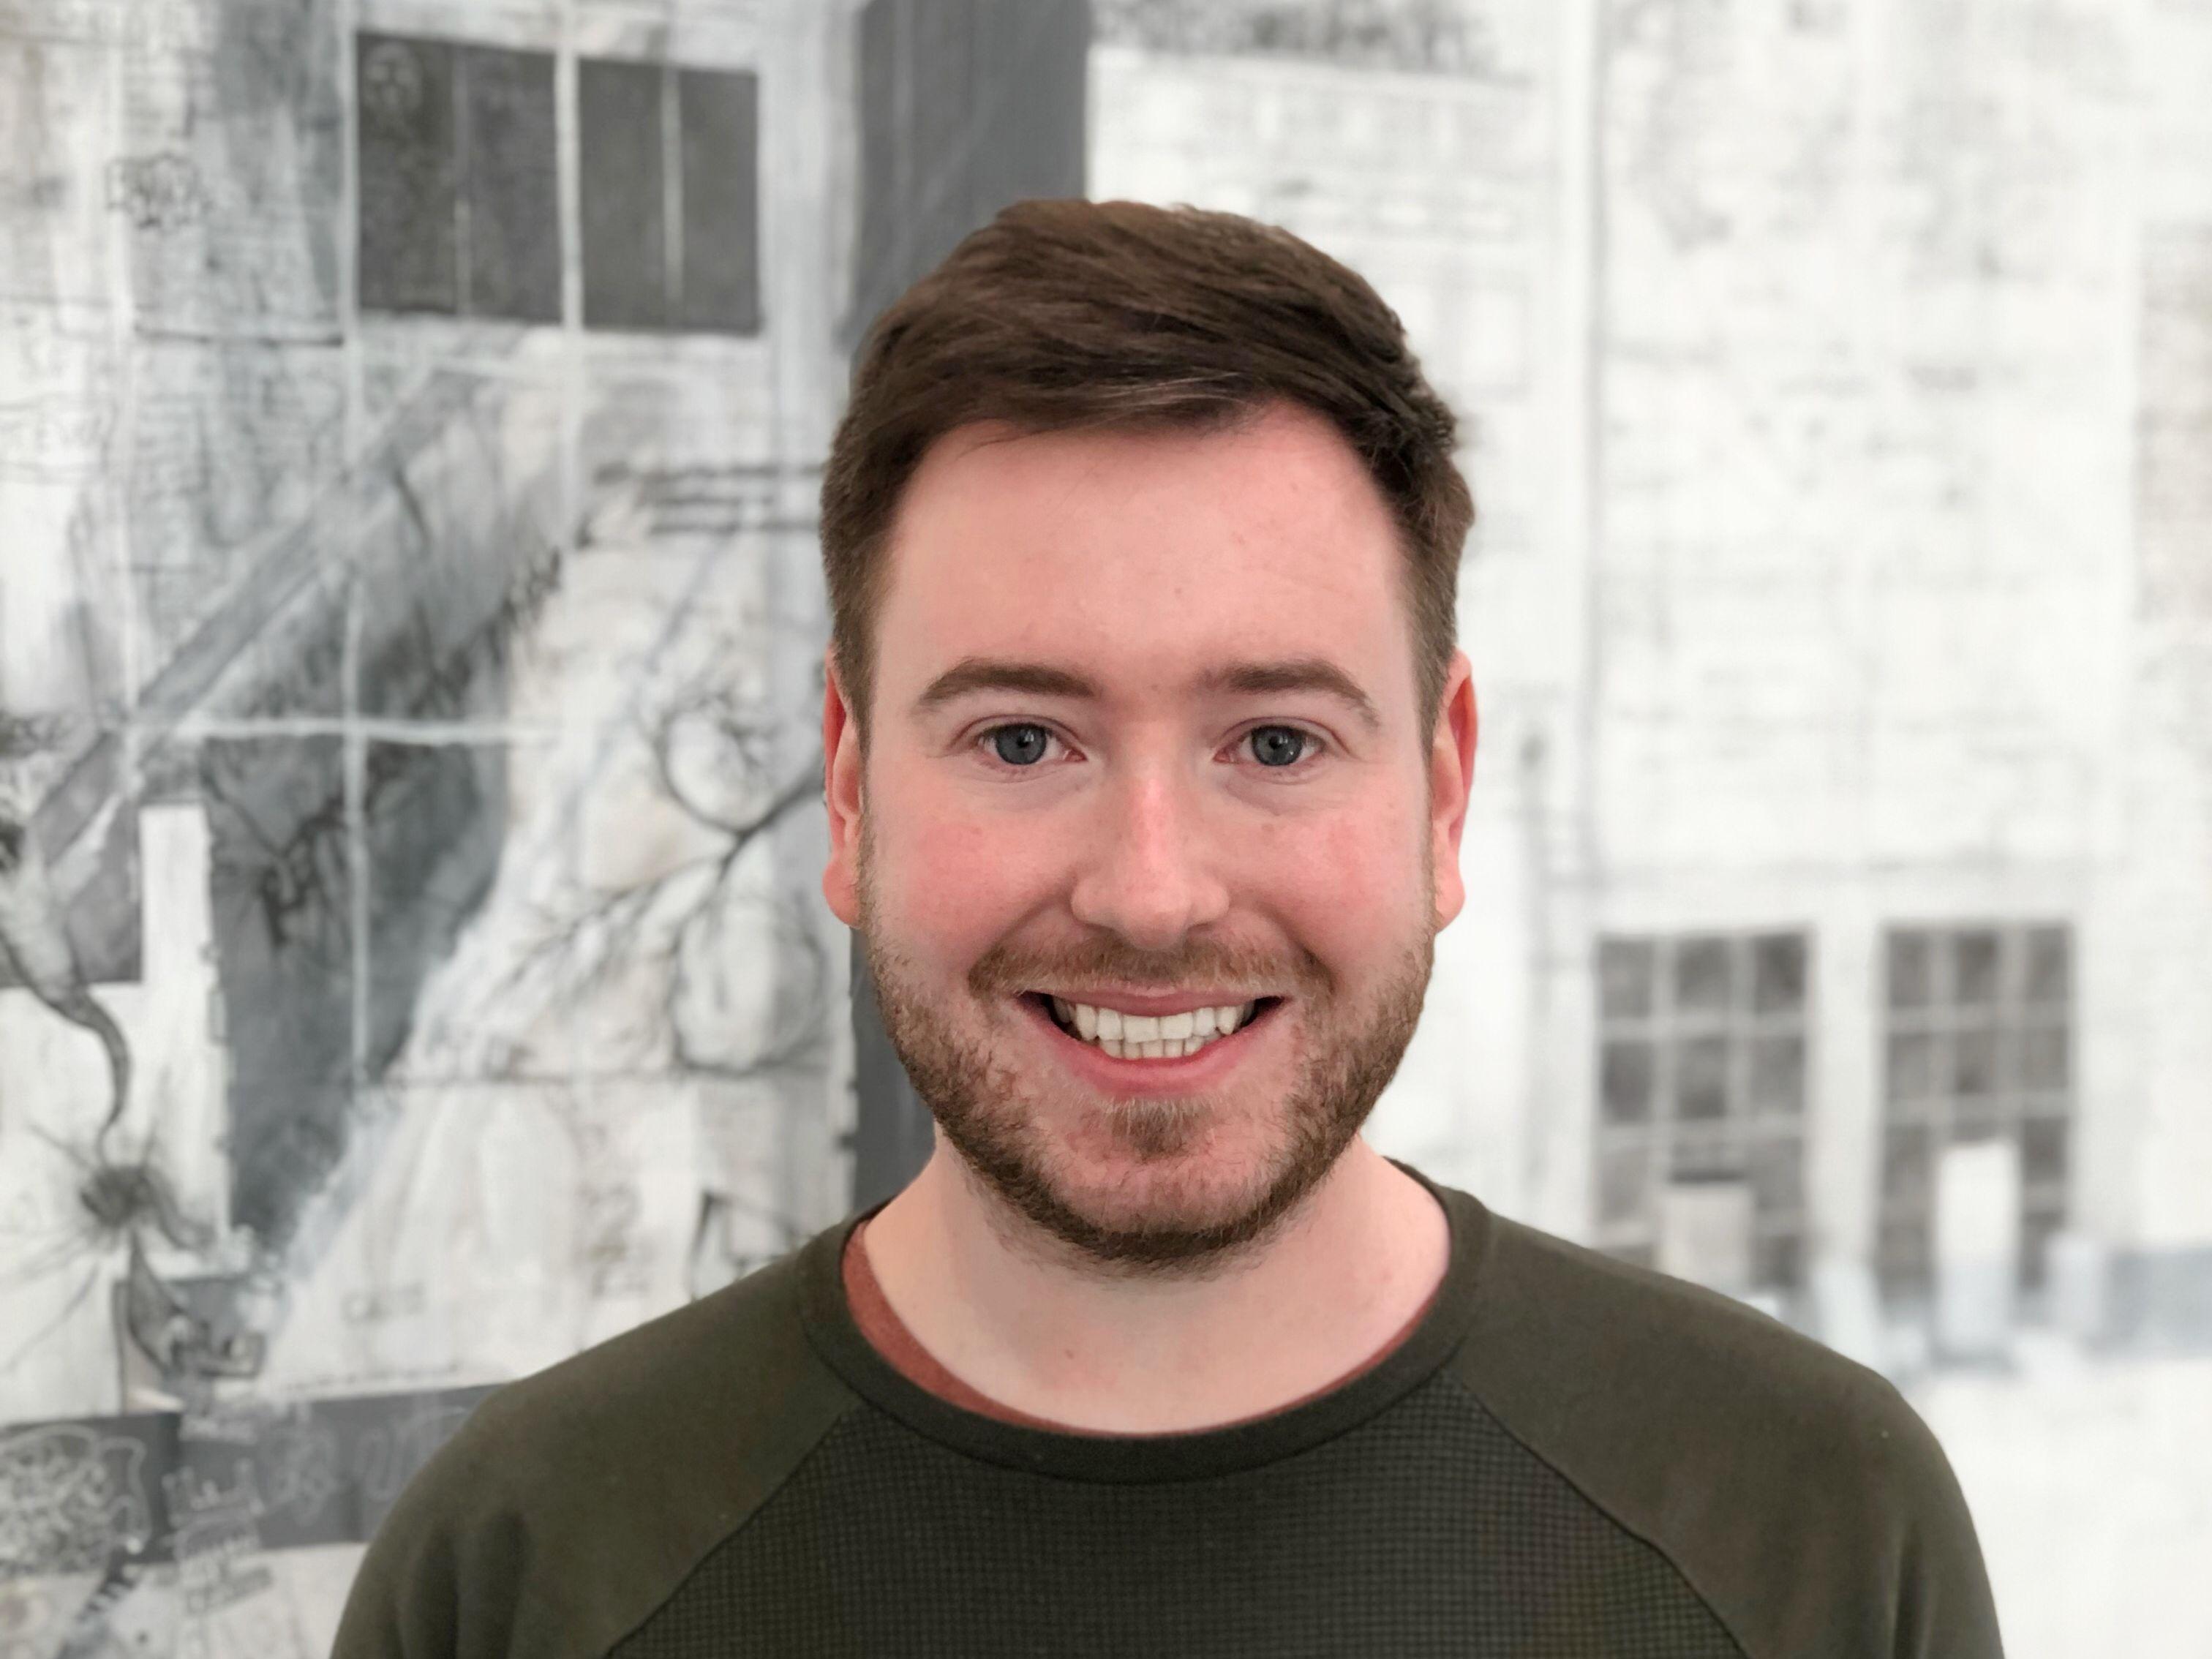 Portrait image of Michael Waters